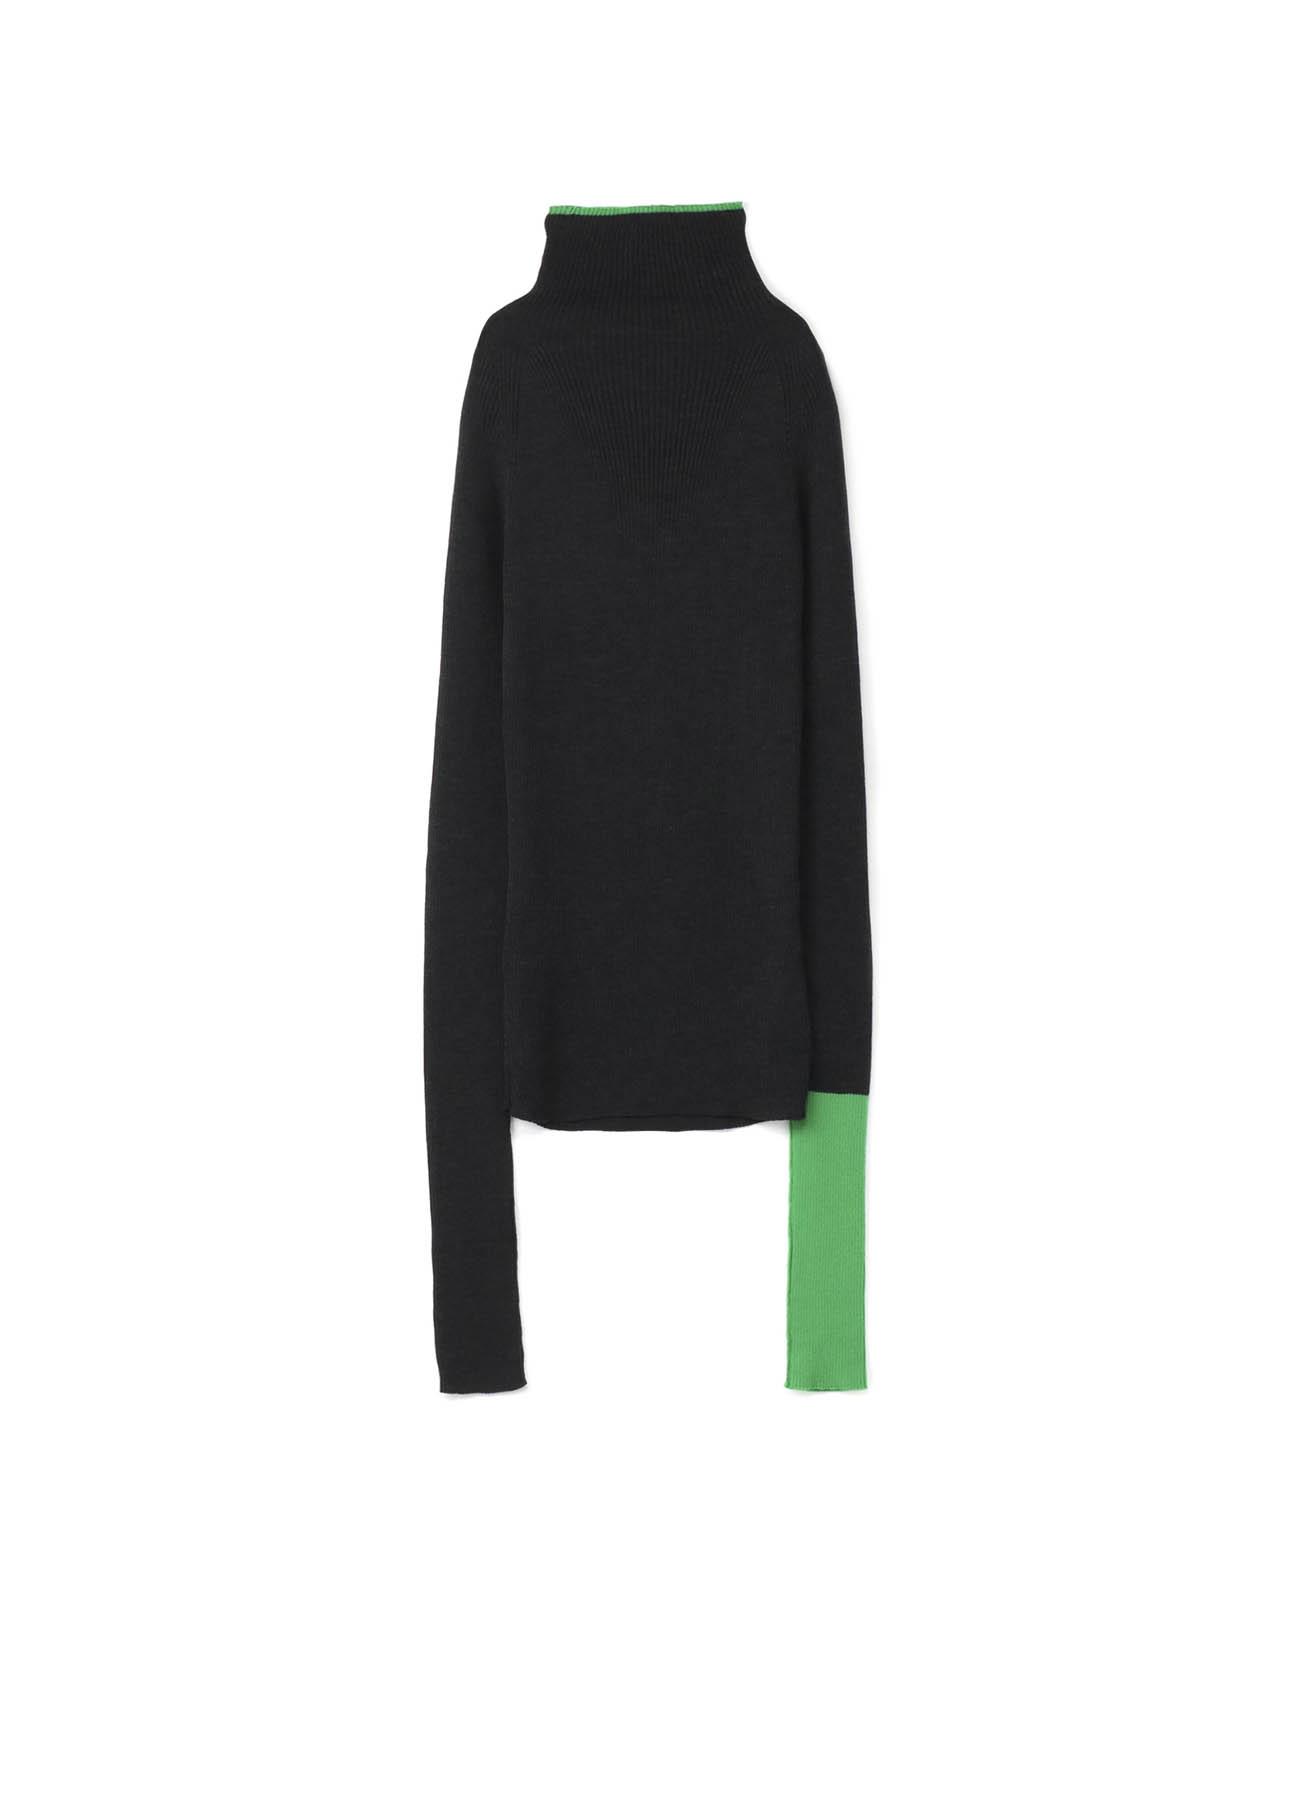 RISMATby Y的SUPER 140强力罗纹罗纹针织高领套头衫